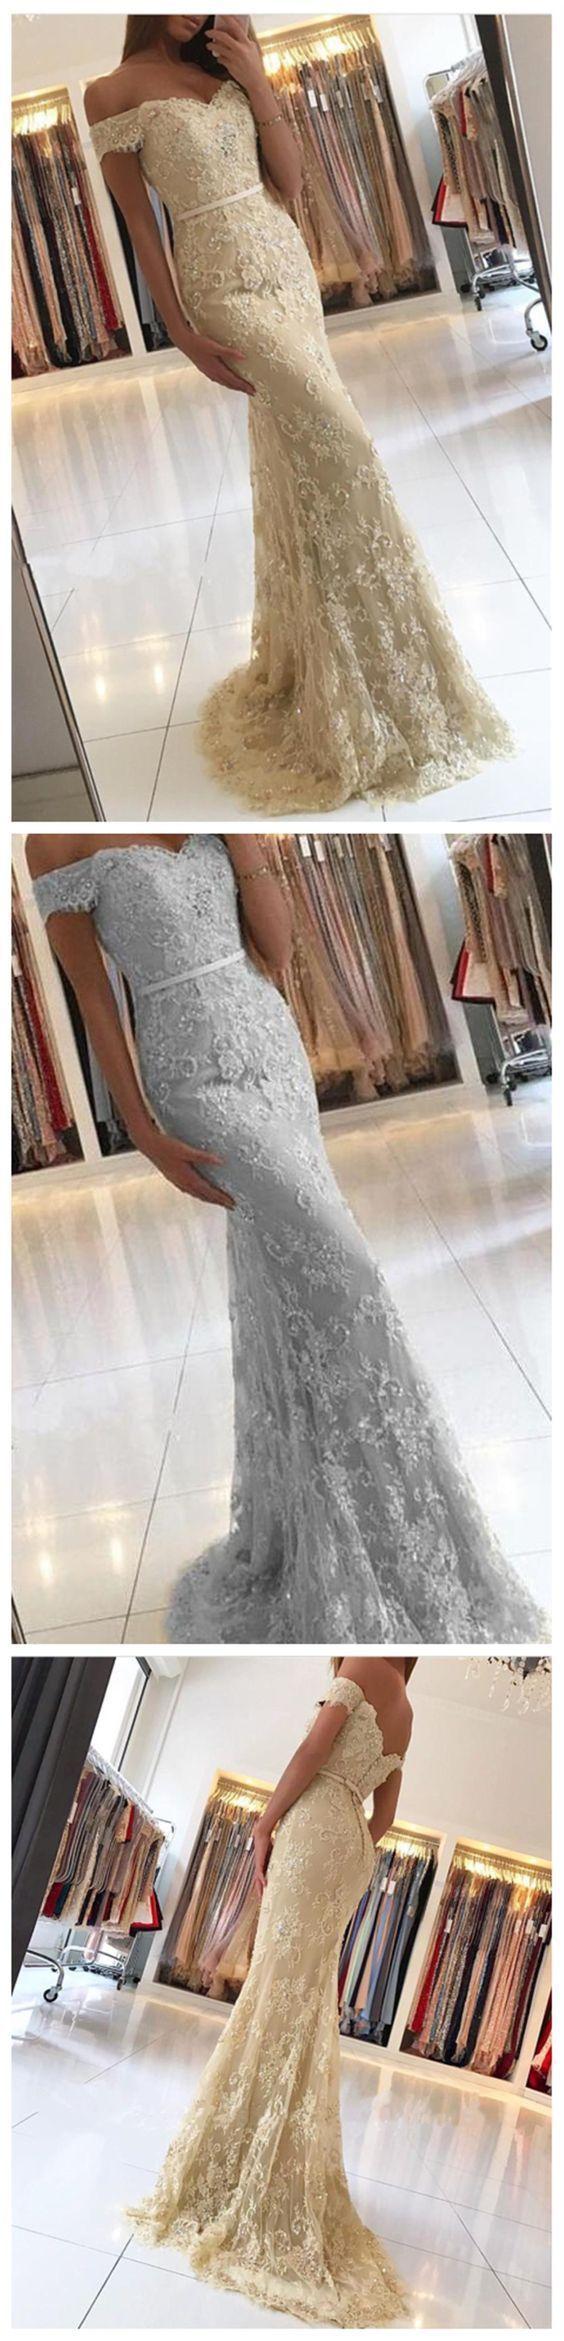 Unique long prom dress gala jurken pinterest long prom dresses